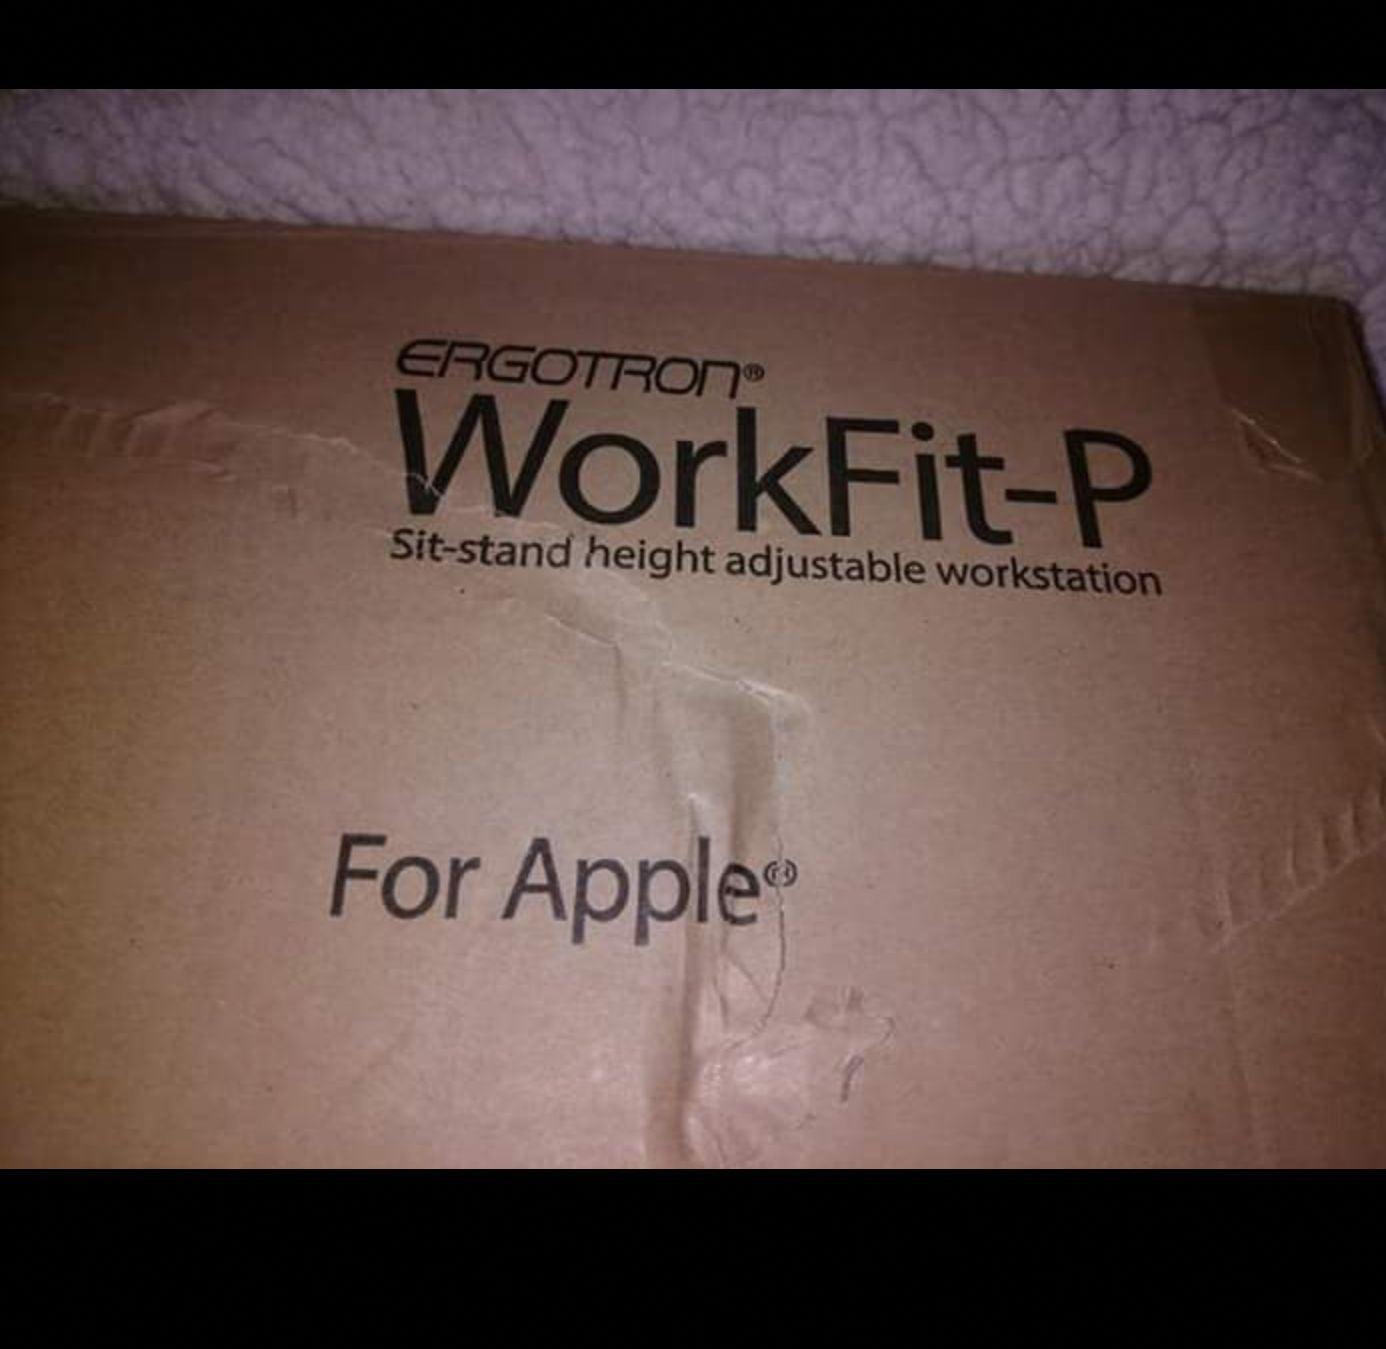 Ergotron Workfit-P New Other